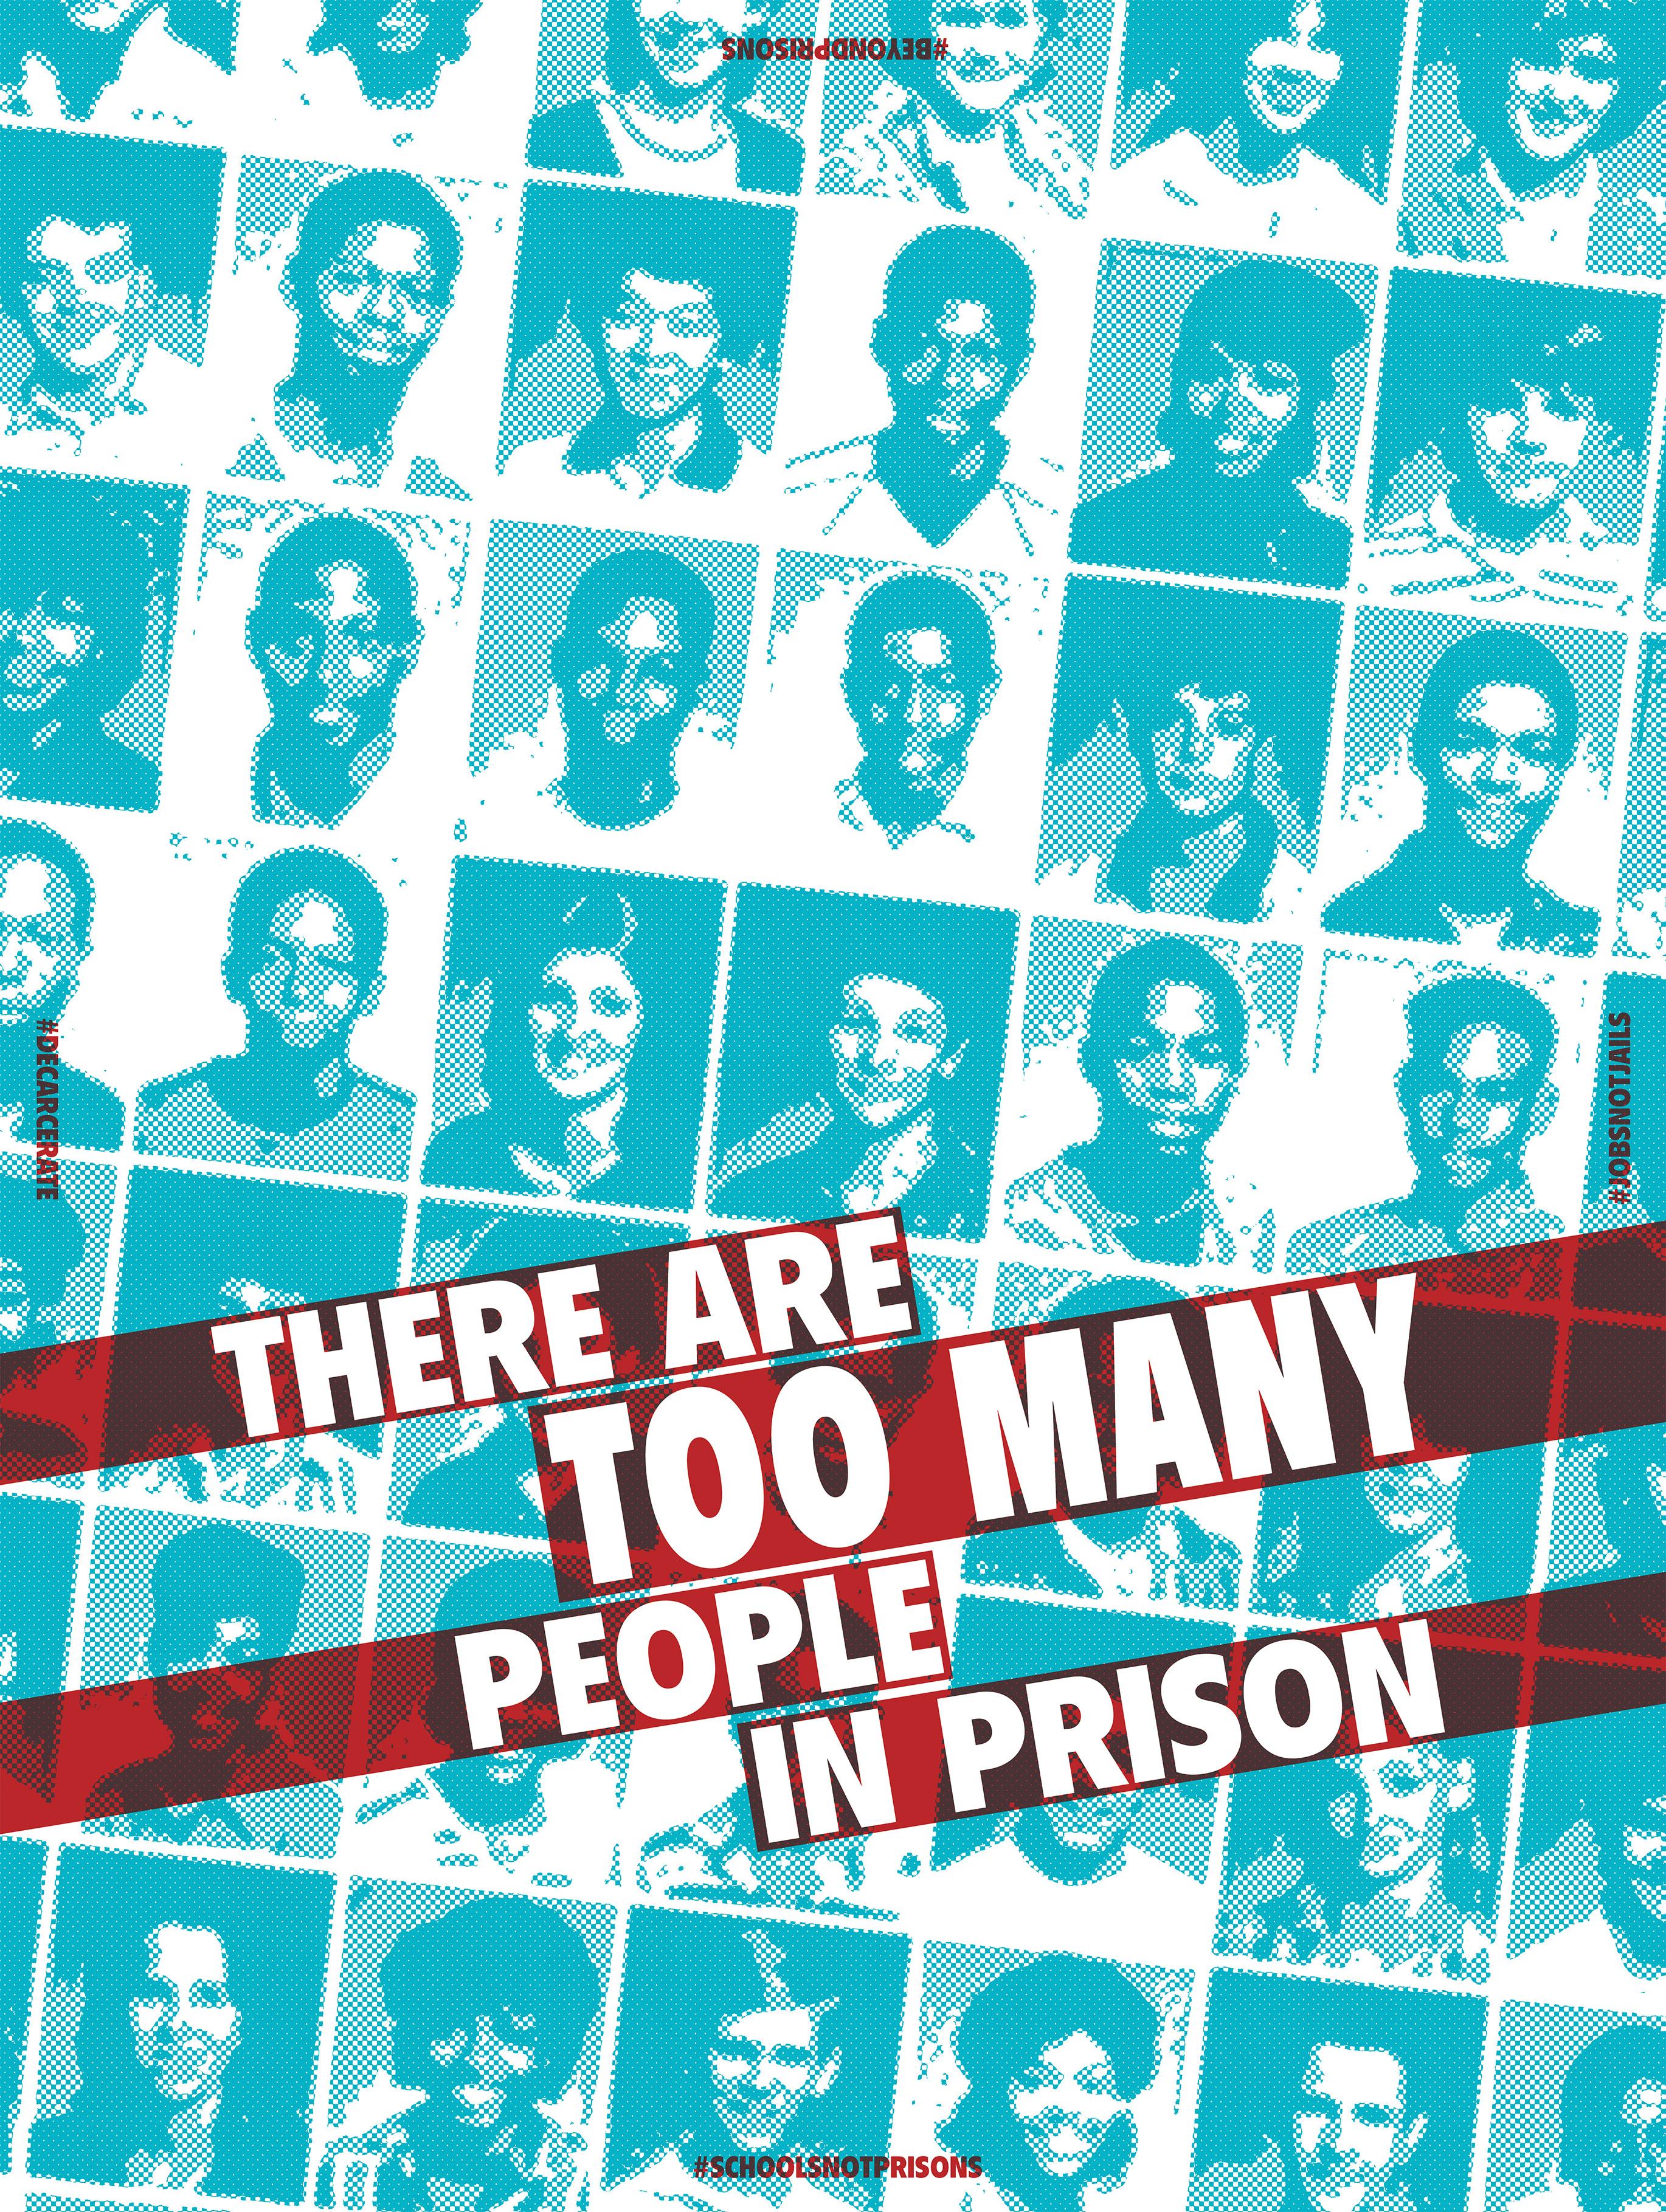 Large_MacPhee_ThereAreTooMany_Prisons_Amplifier.jpg